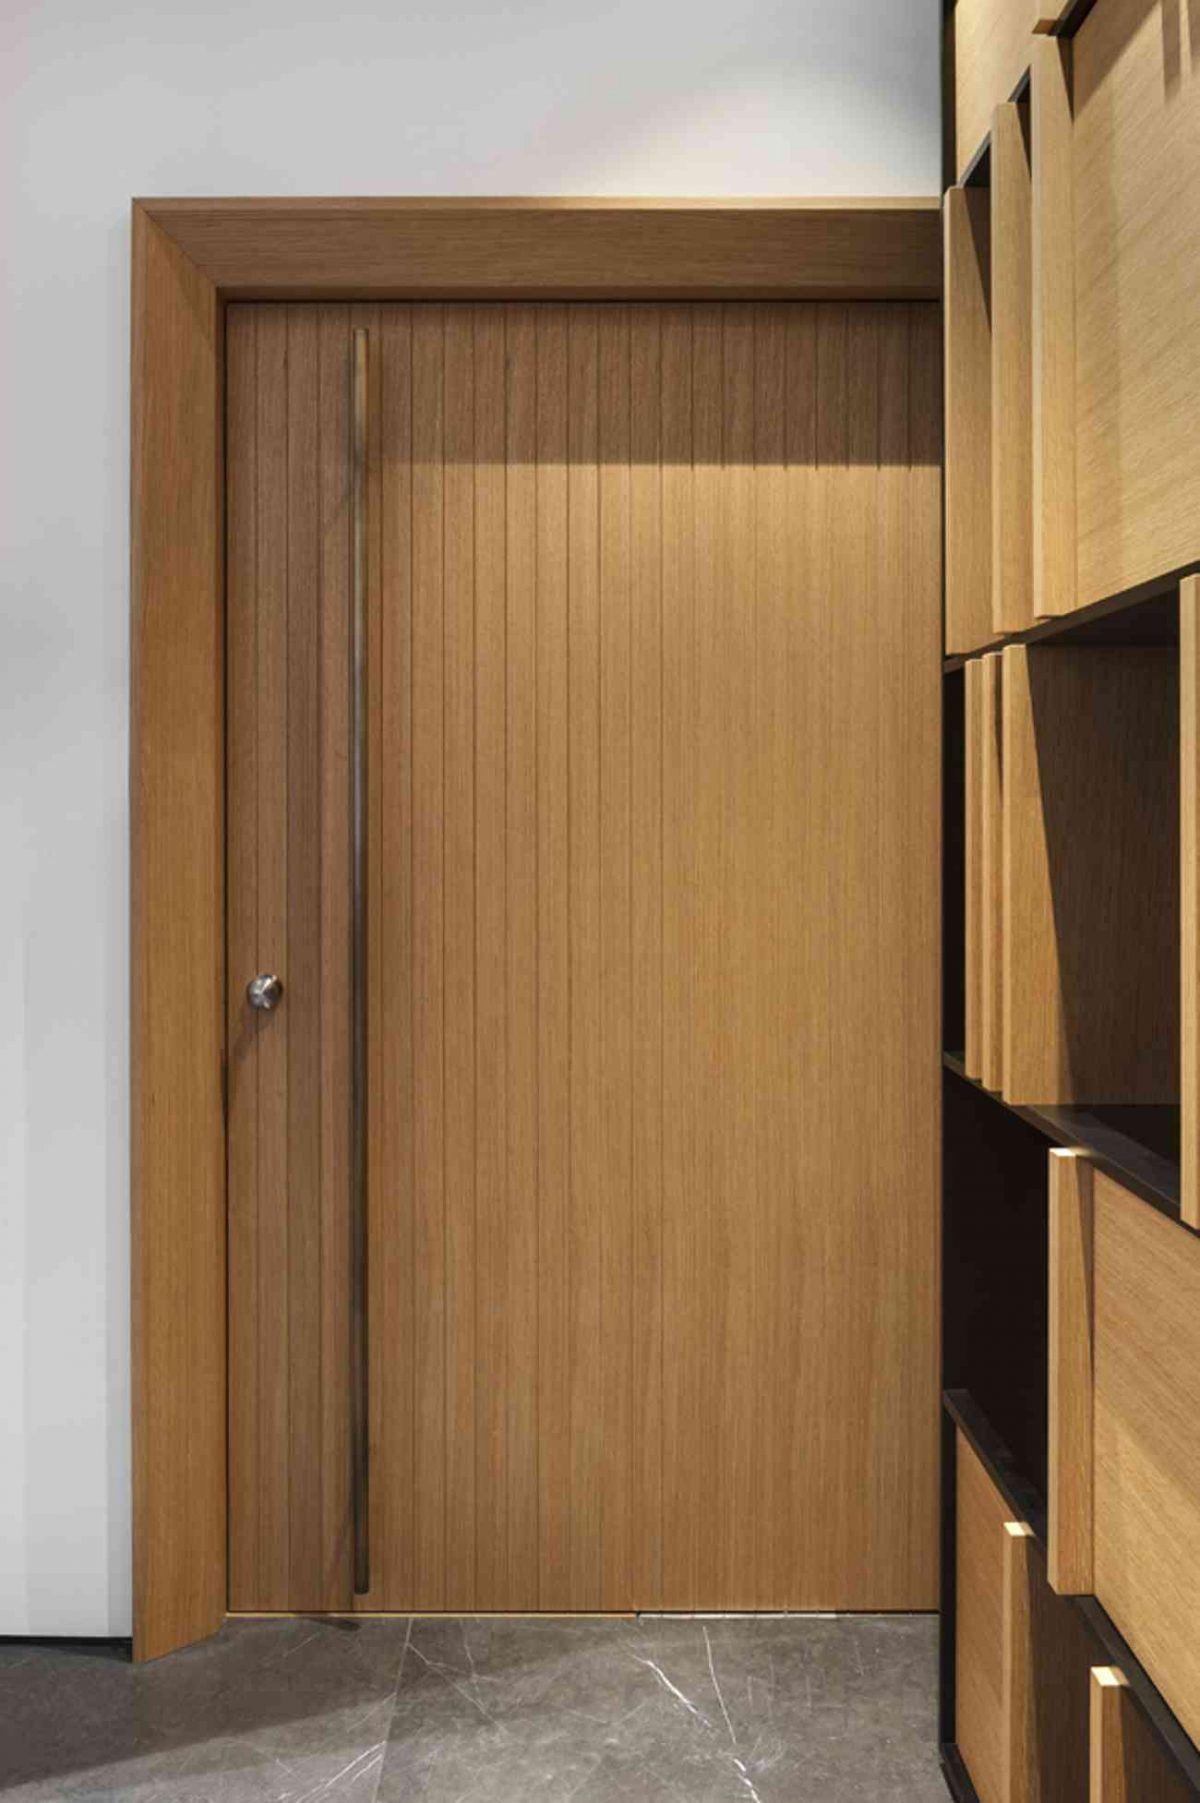 Vista – Netanya הקרנת גוף תאורה מעל דלת הכניסה בעיצובו של קמחי תאורה